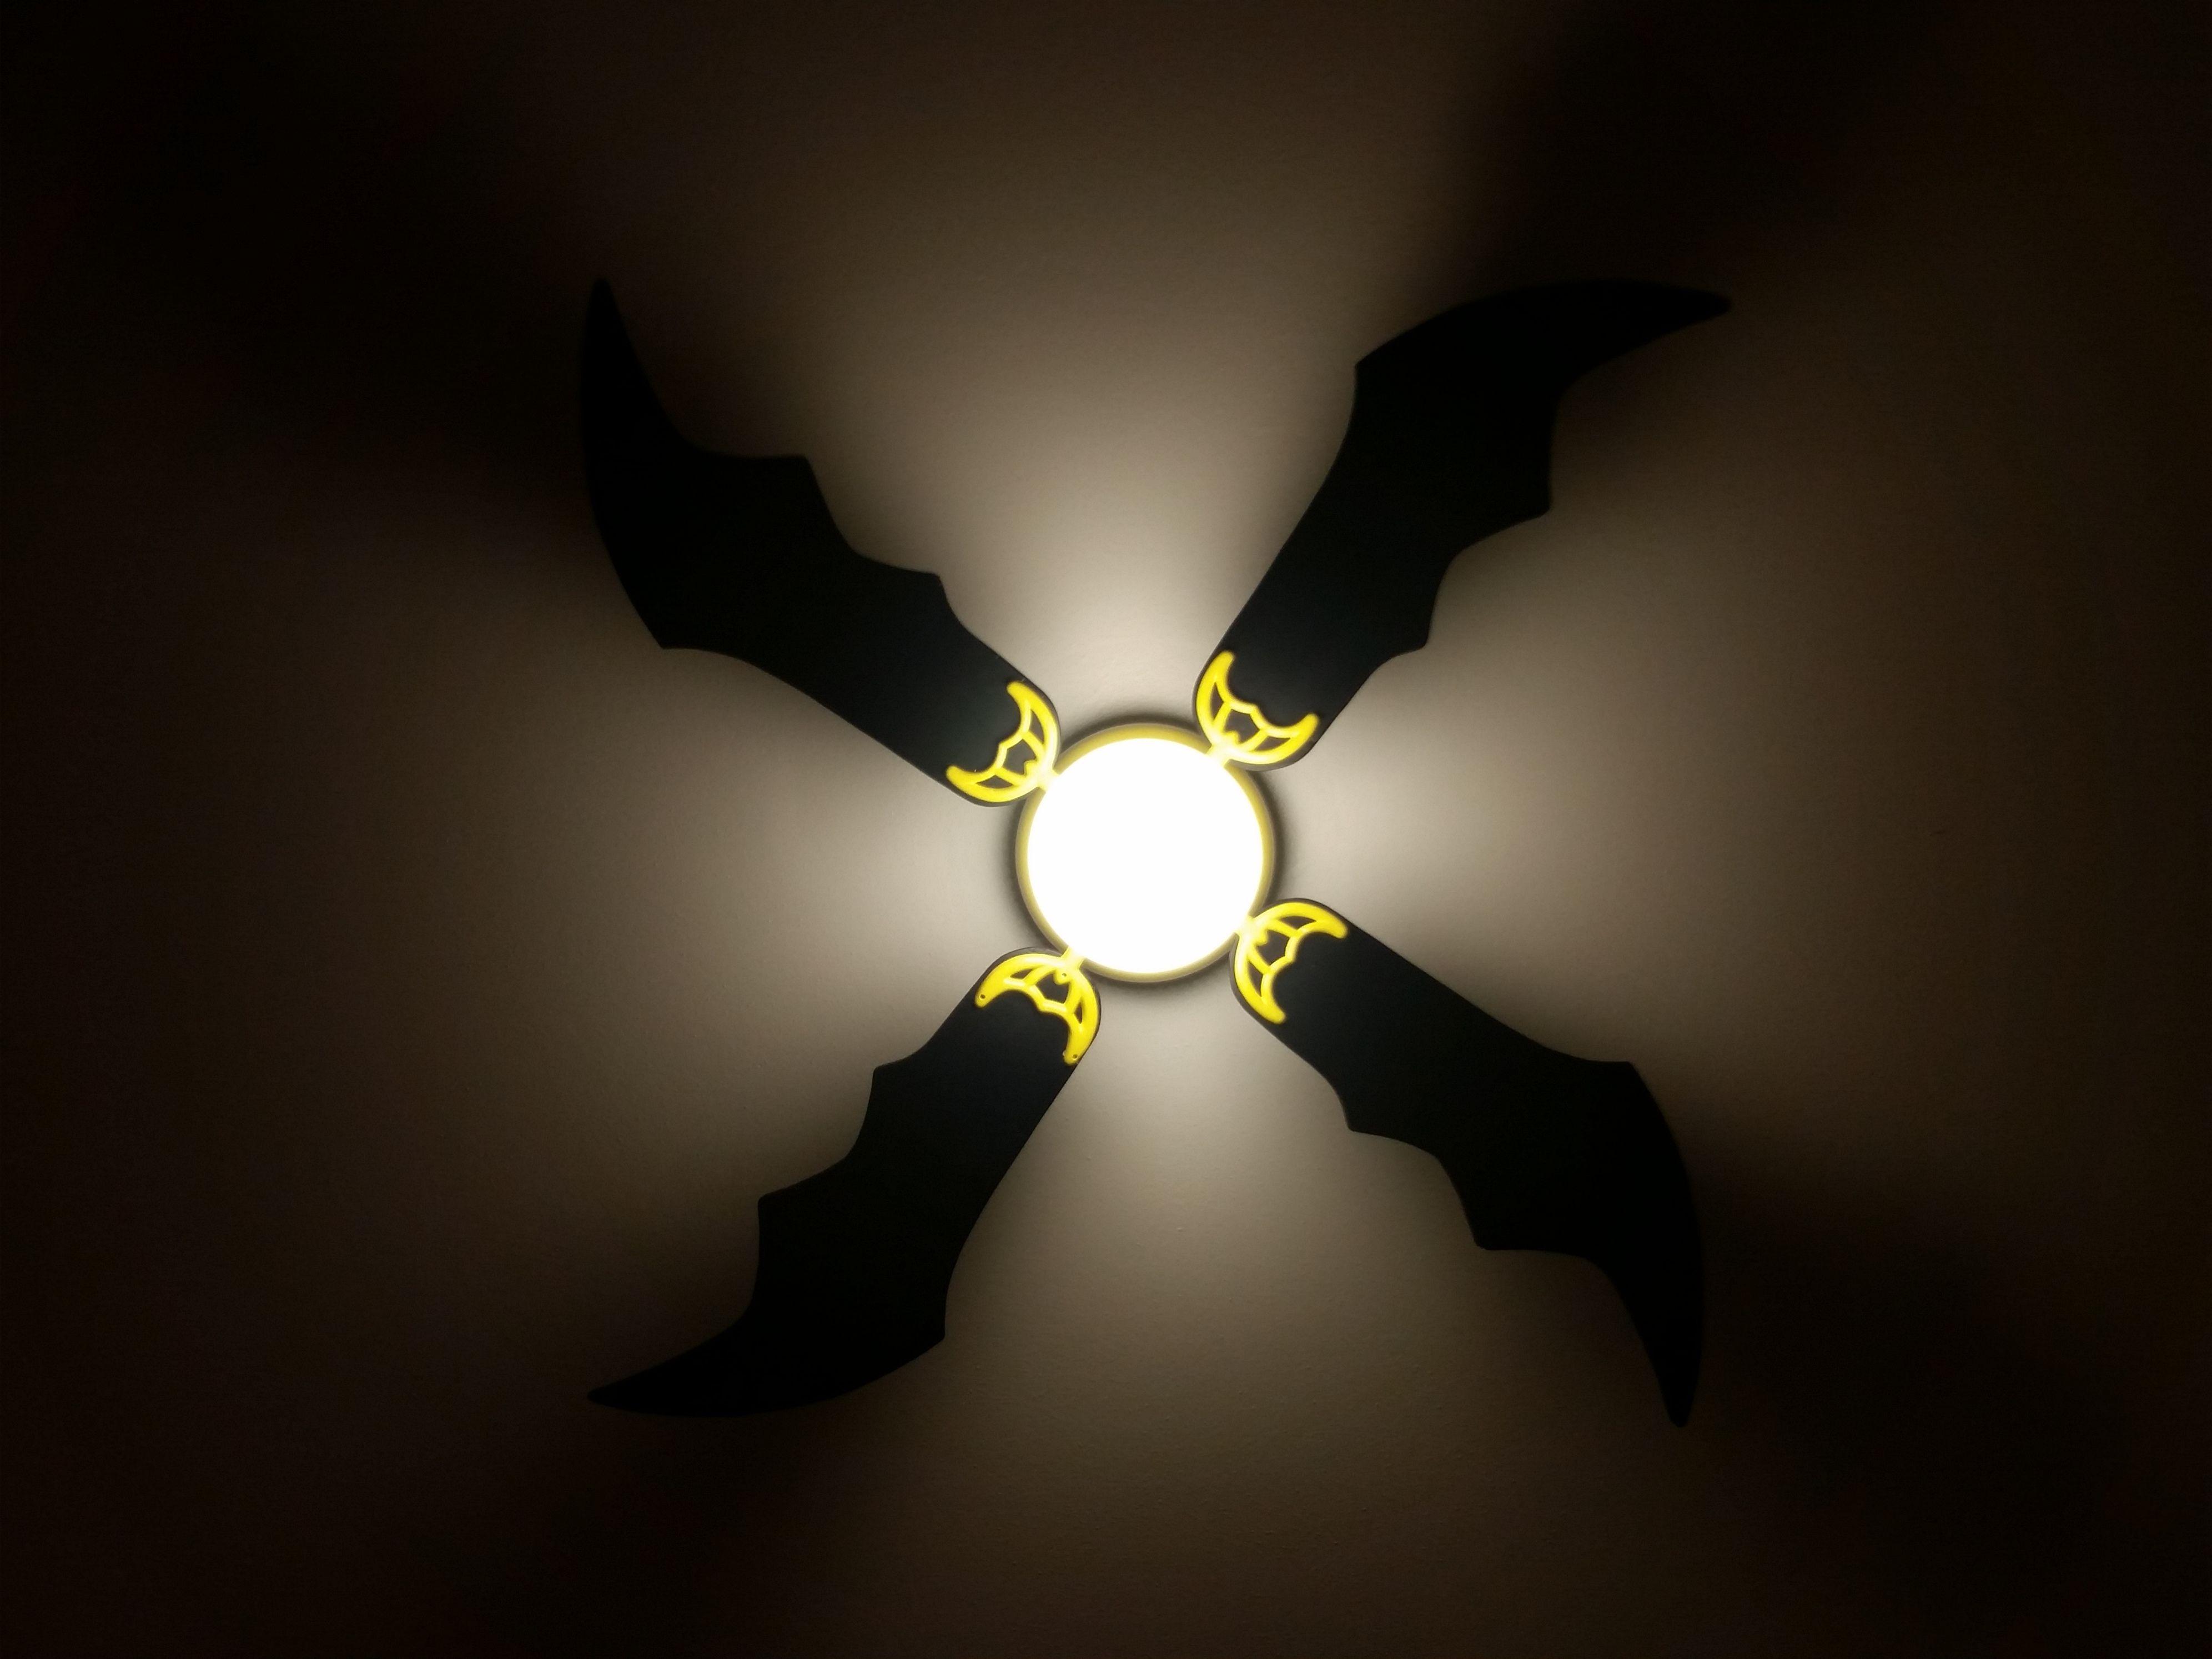 Batman ceiling fan with flash on. | Micah's Superhero Room ...